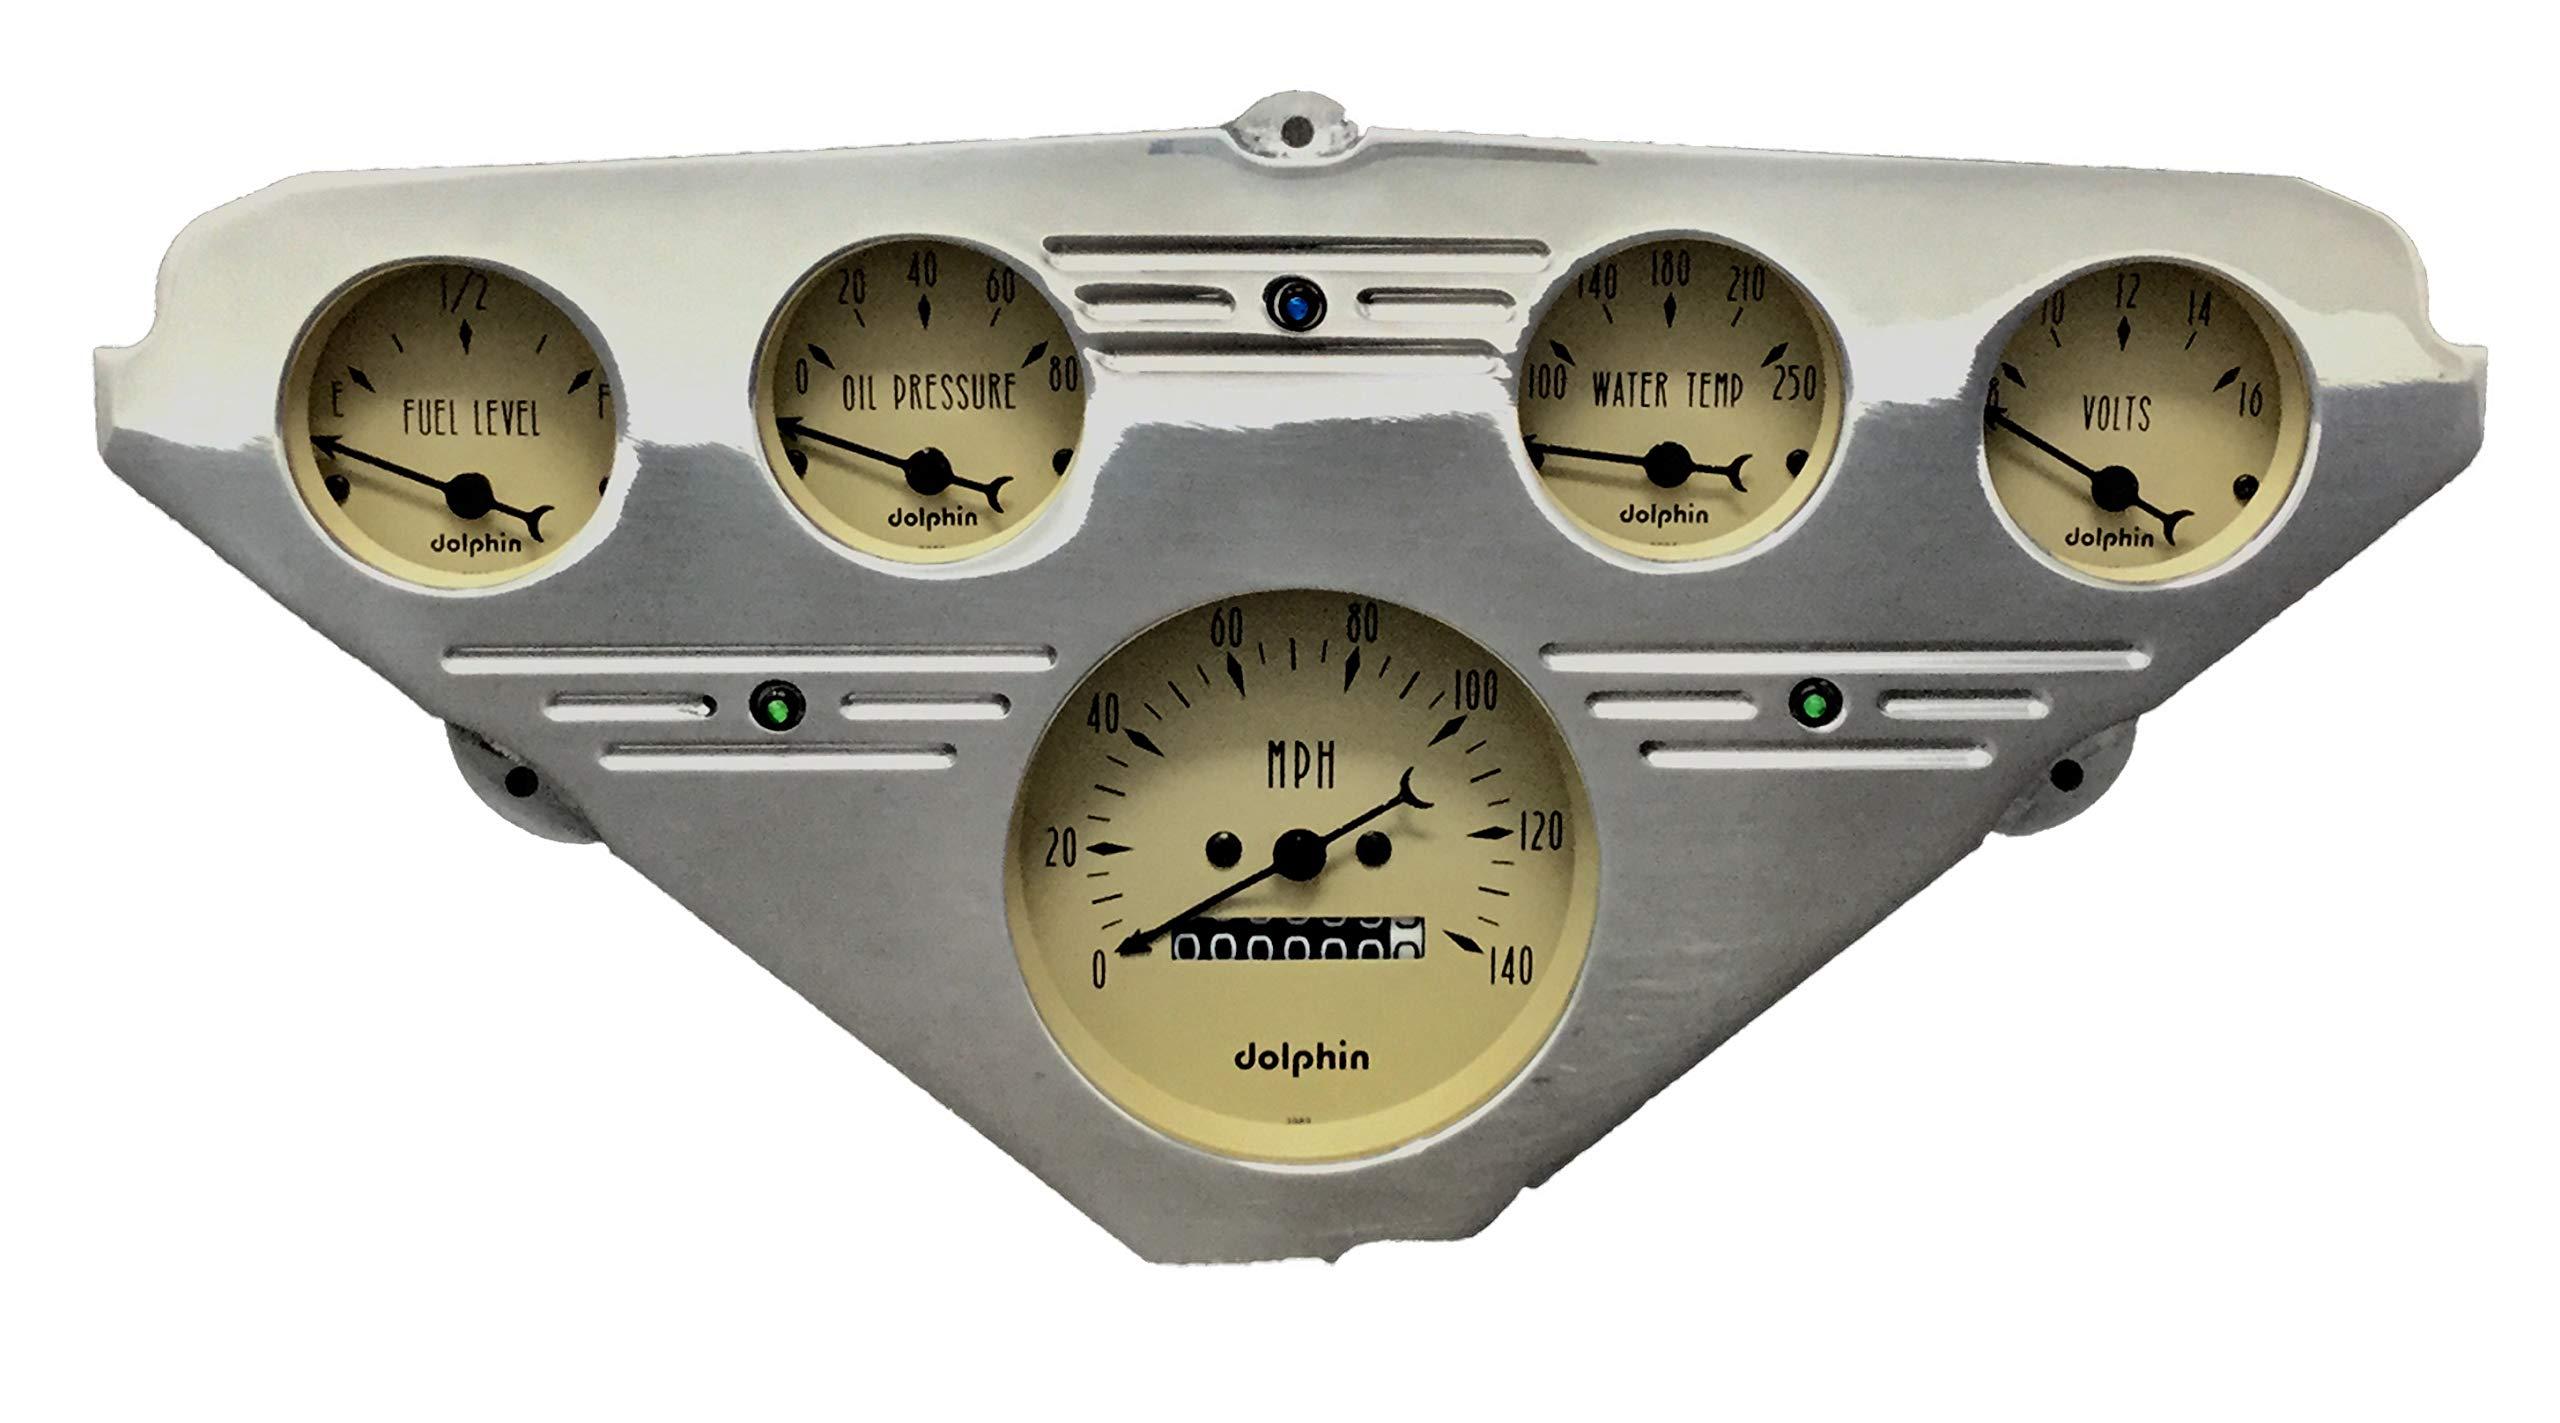 Dolphin Gauges 1955 1956 1957 1958 1959 Chevy Truck 5 Gauge Dash Cluster Panel Set Mechanical Tan